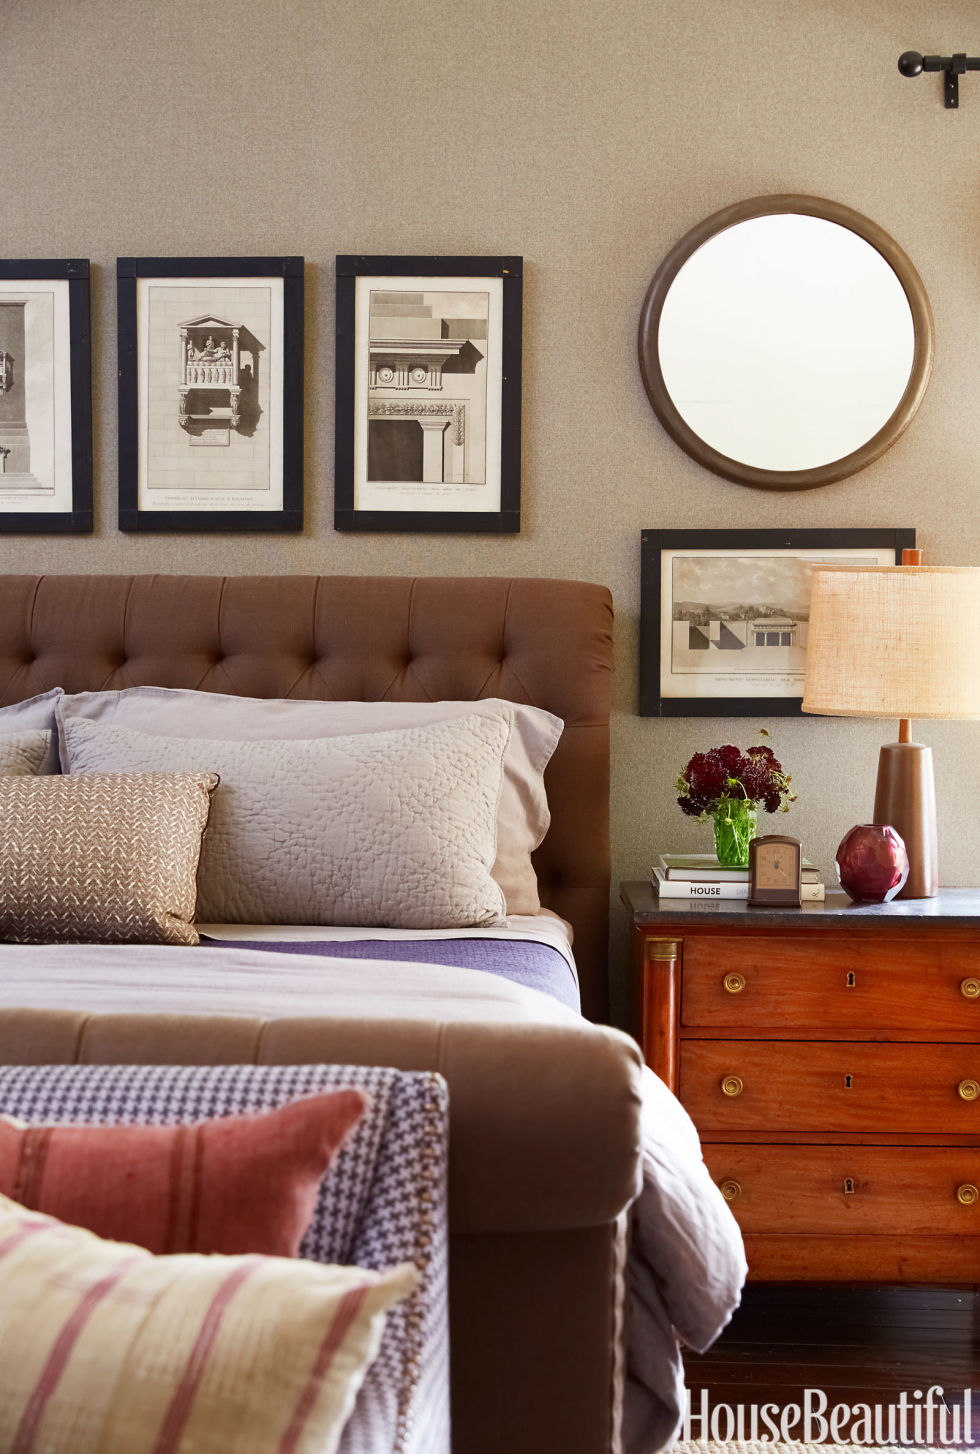 Bedroom bedroom decorating ideas with brown furniture cottage - Bedroom Bedroom Decorating Ideas With Brown Furniture Cottage 43